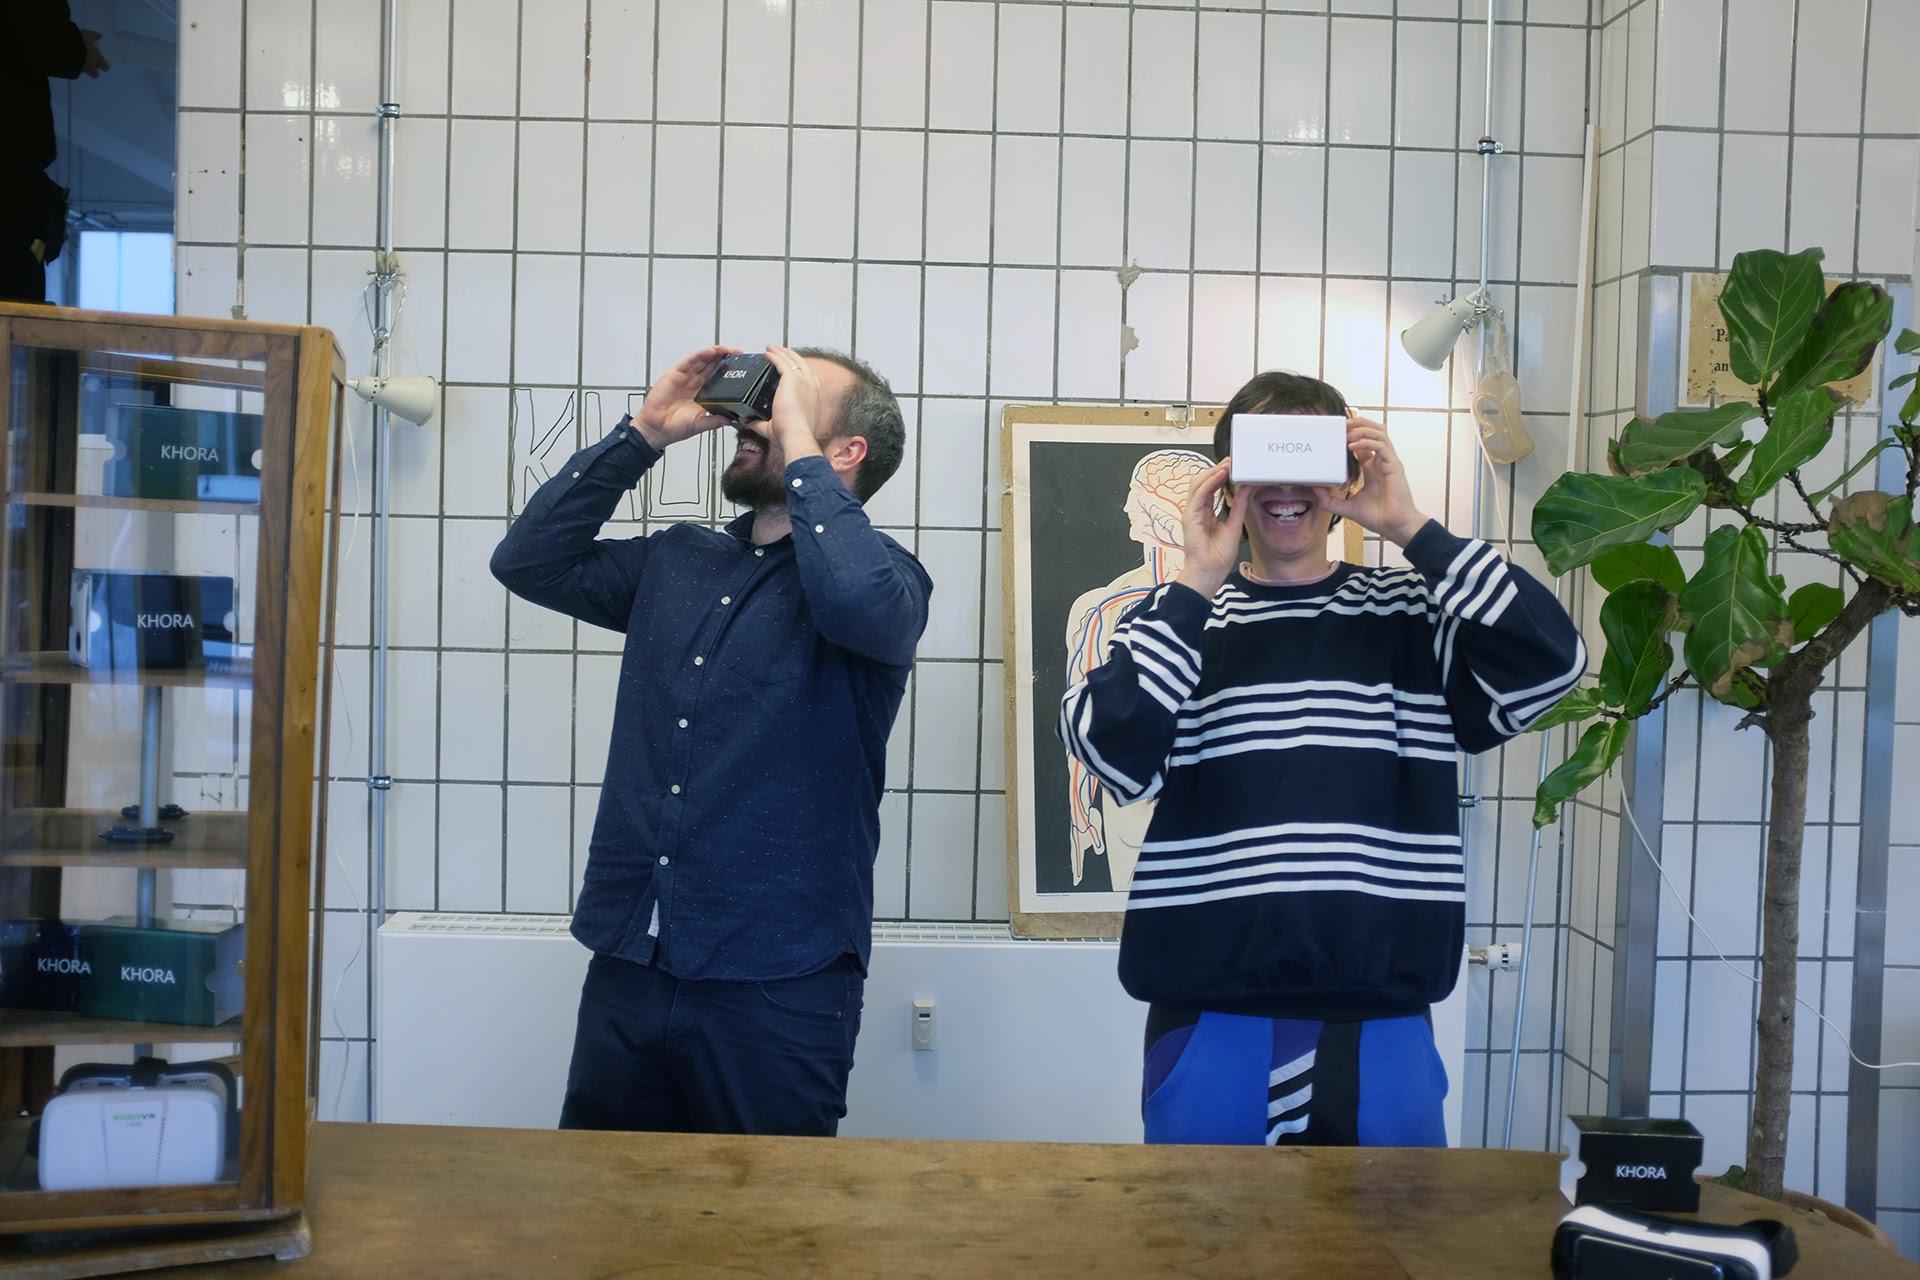 Copenhagen Gets First Virtual Reality Store